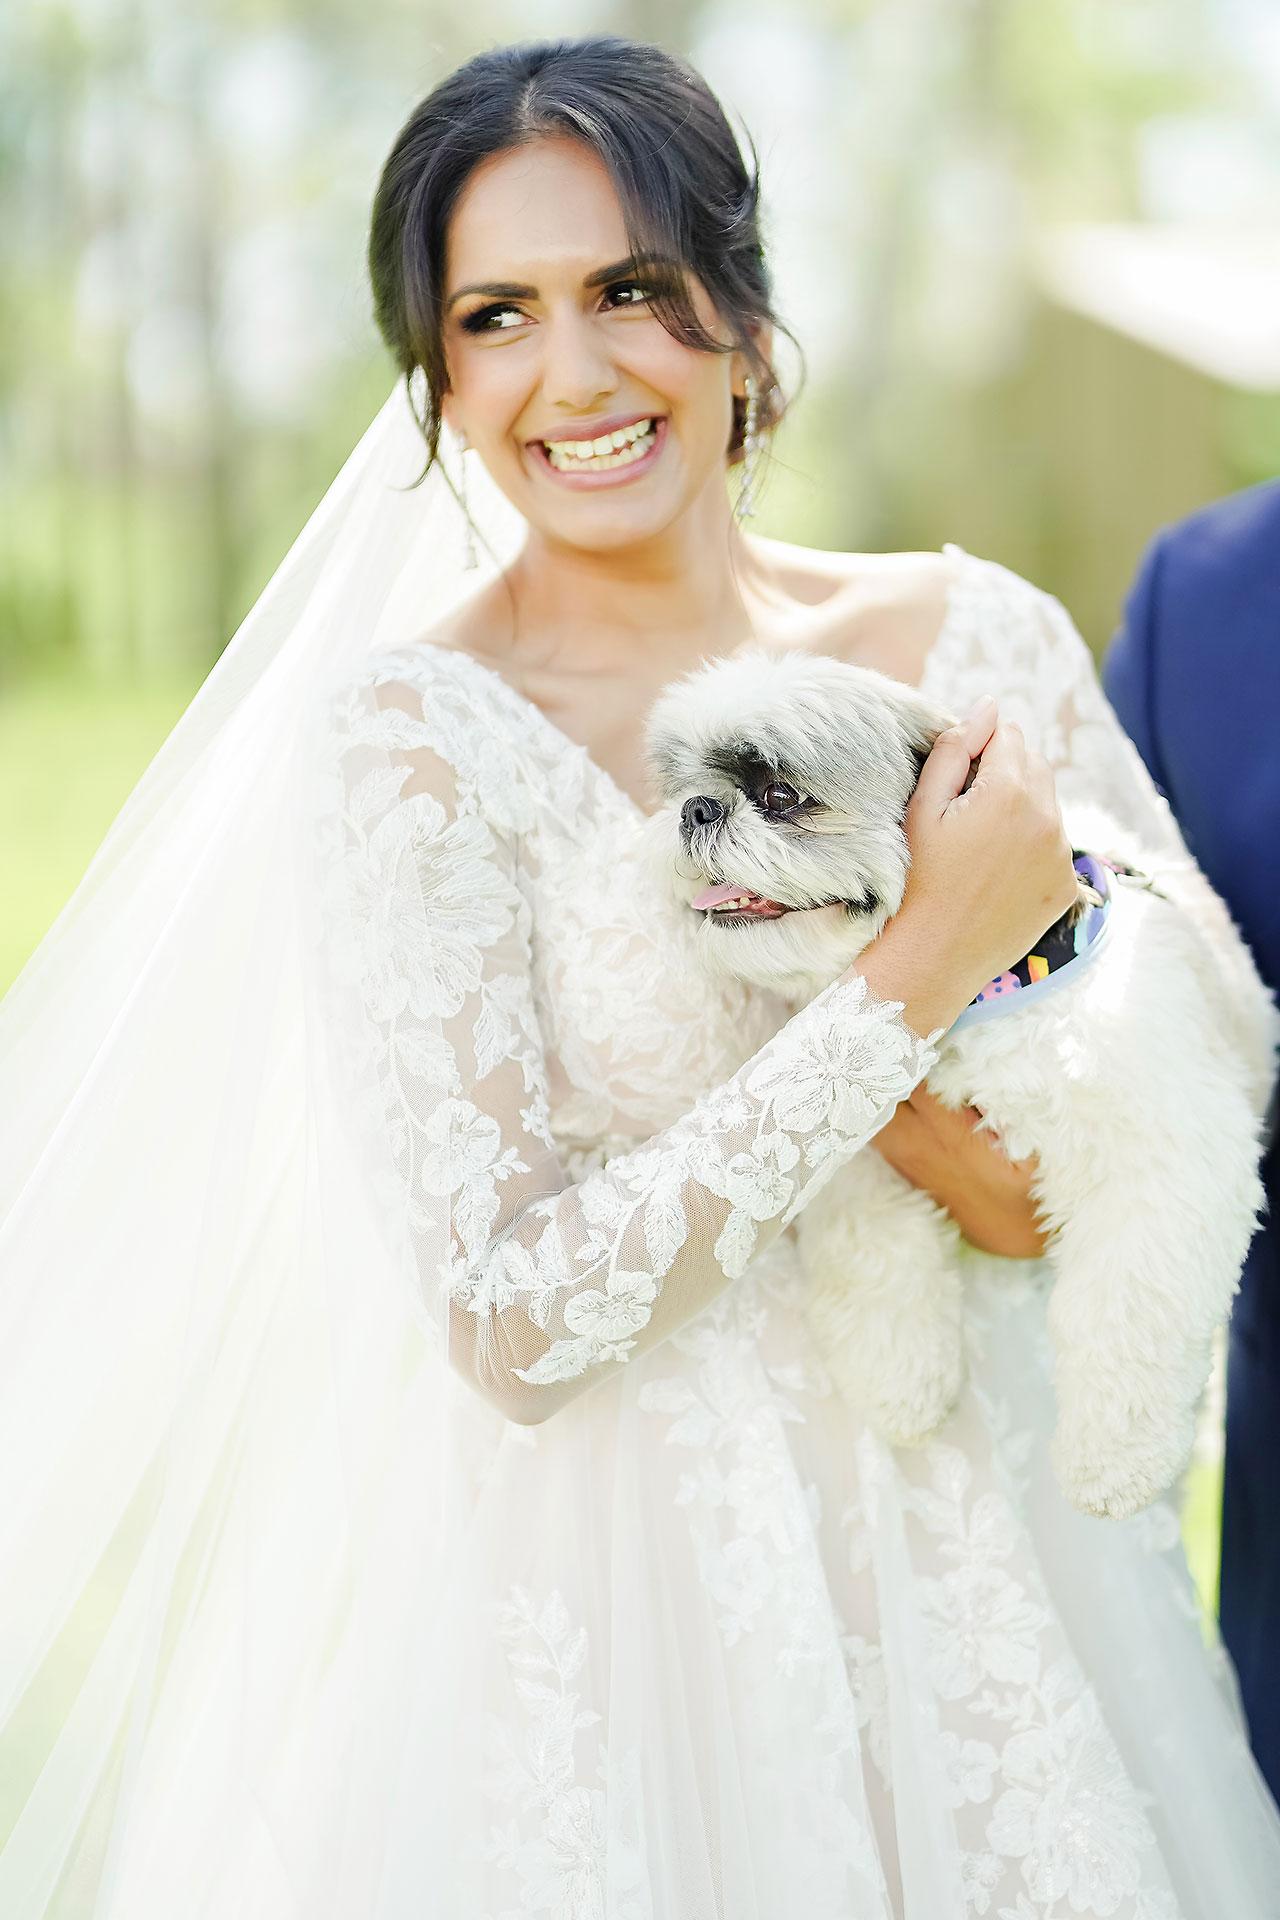 Nadia Parker Black Iris Estate Carmel Indiana Wedding May 2021 059